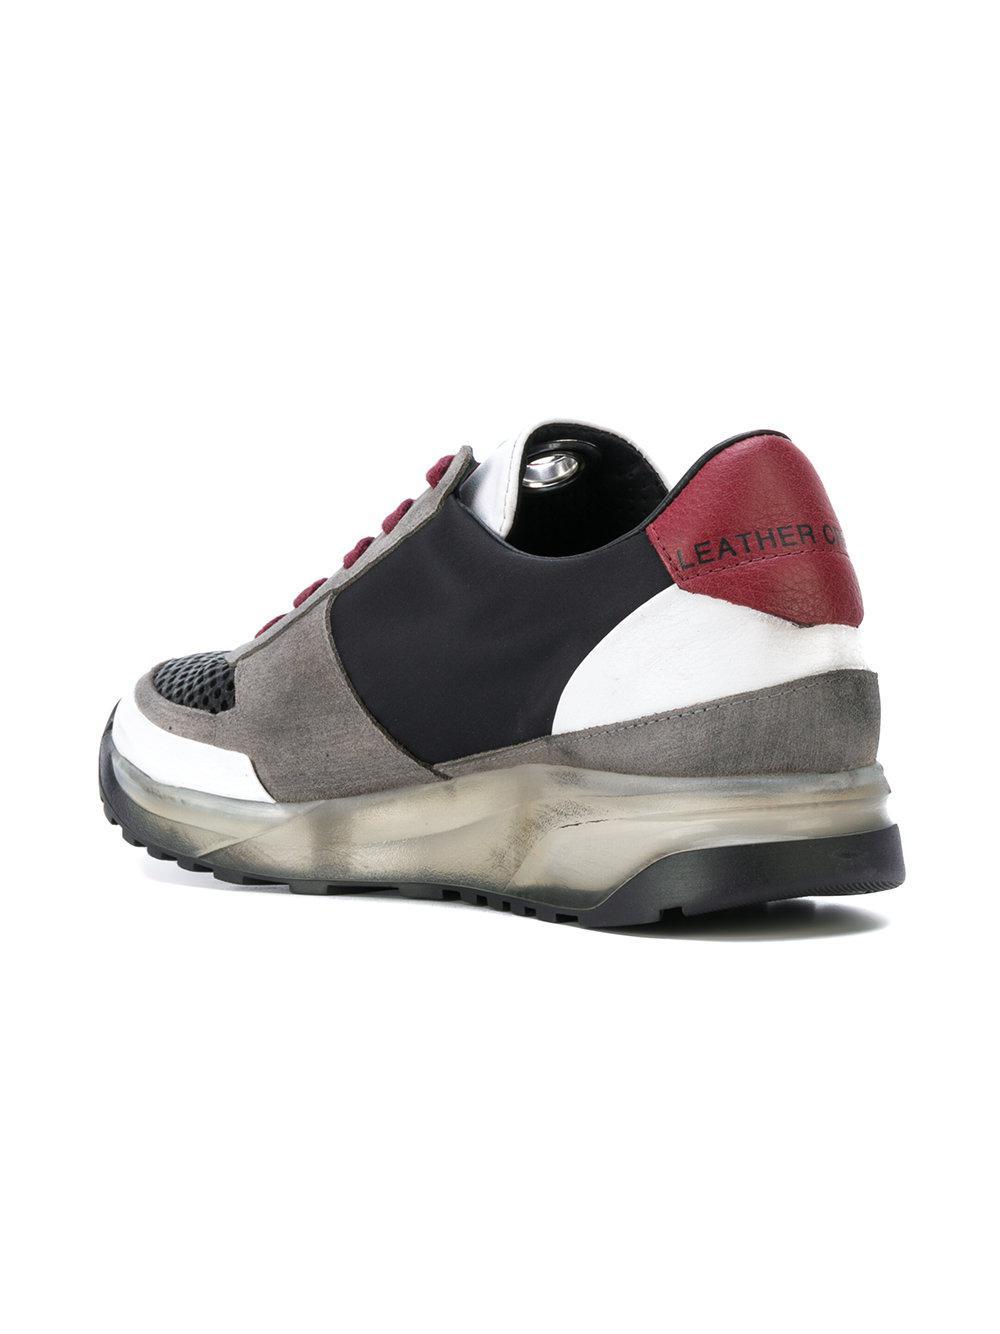 Maero Leather Sneakers Men Crown Black For OPkZXiu